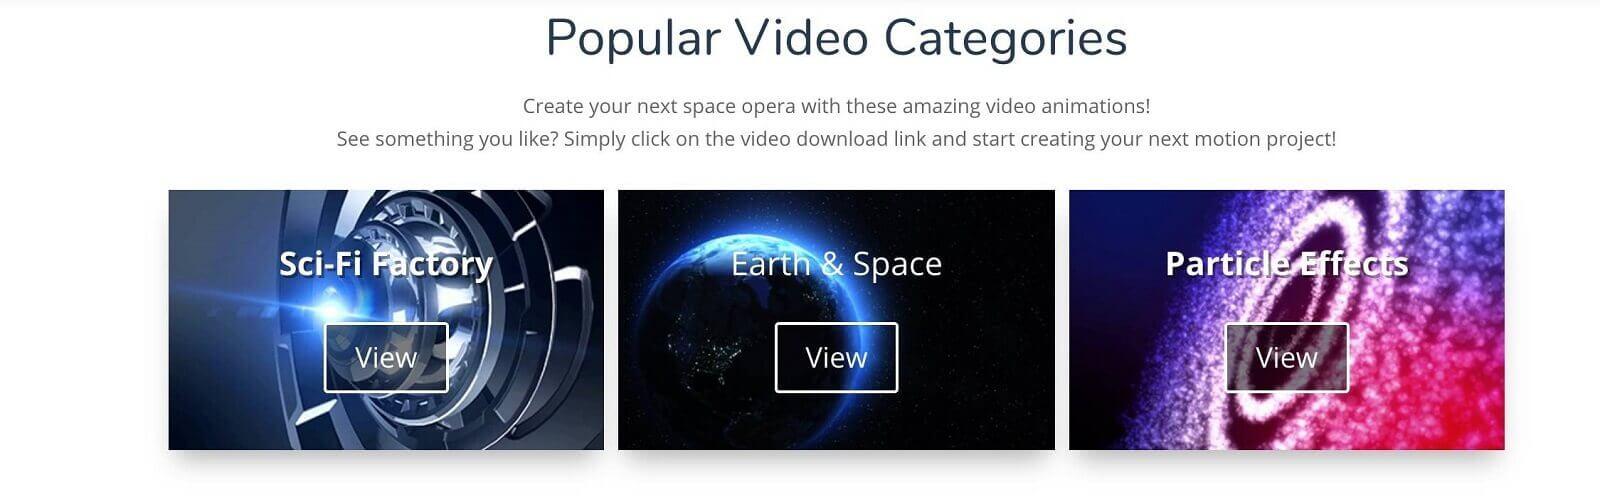 Best Green Screen Background Video - Popular Video Categories - Ignite Motion